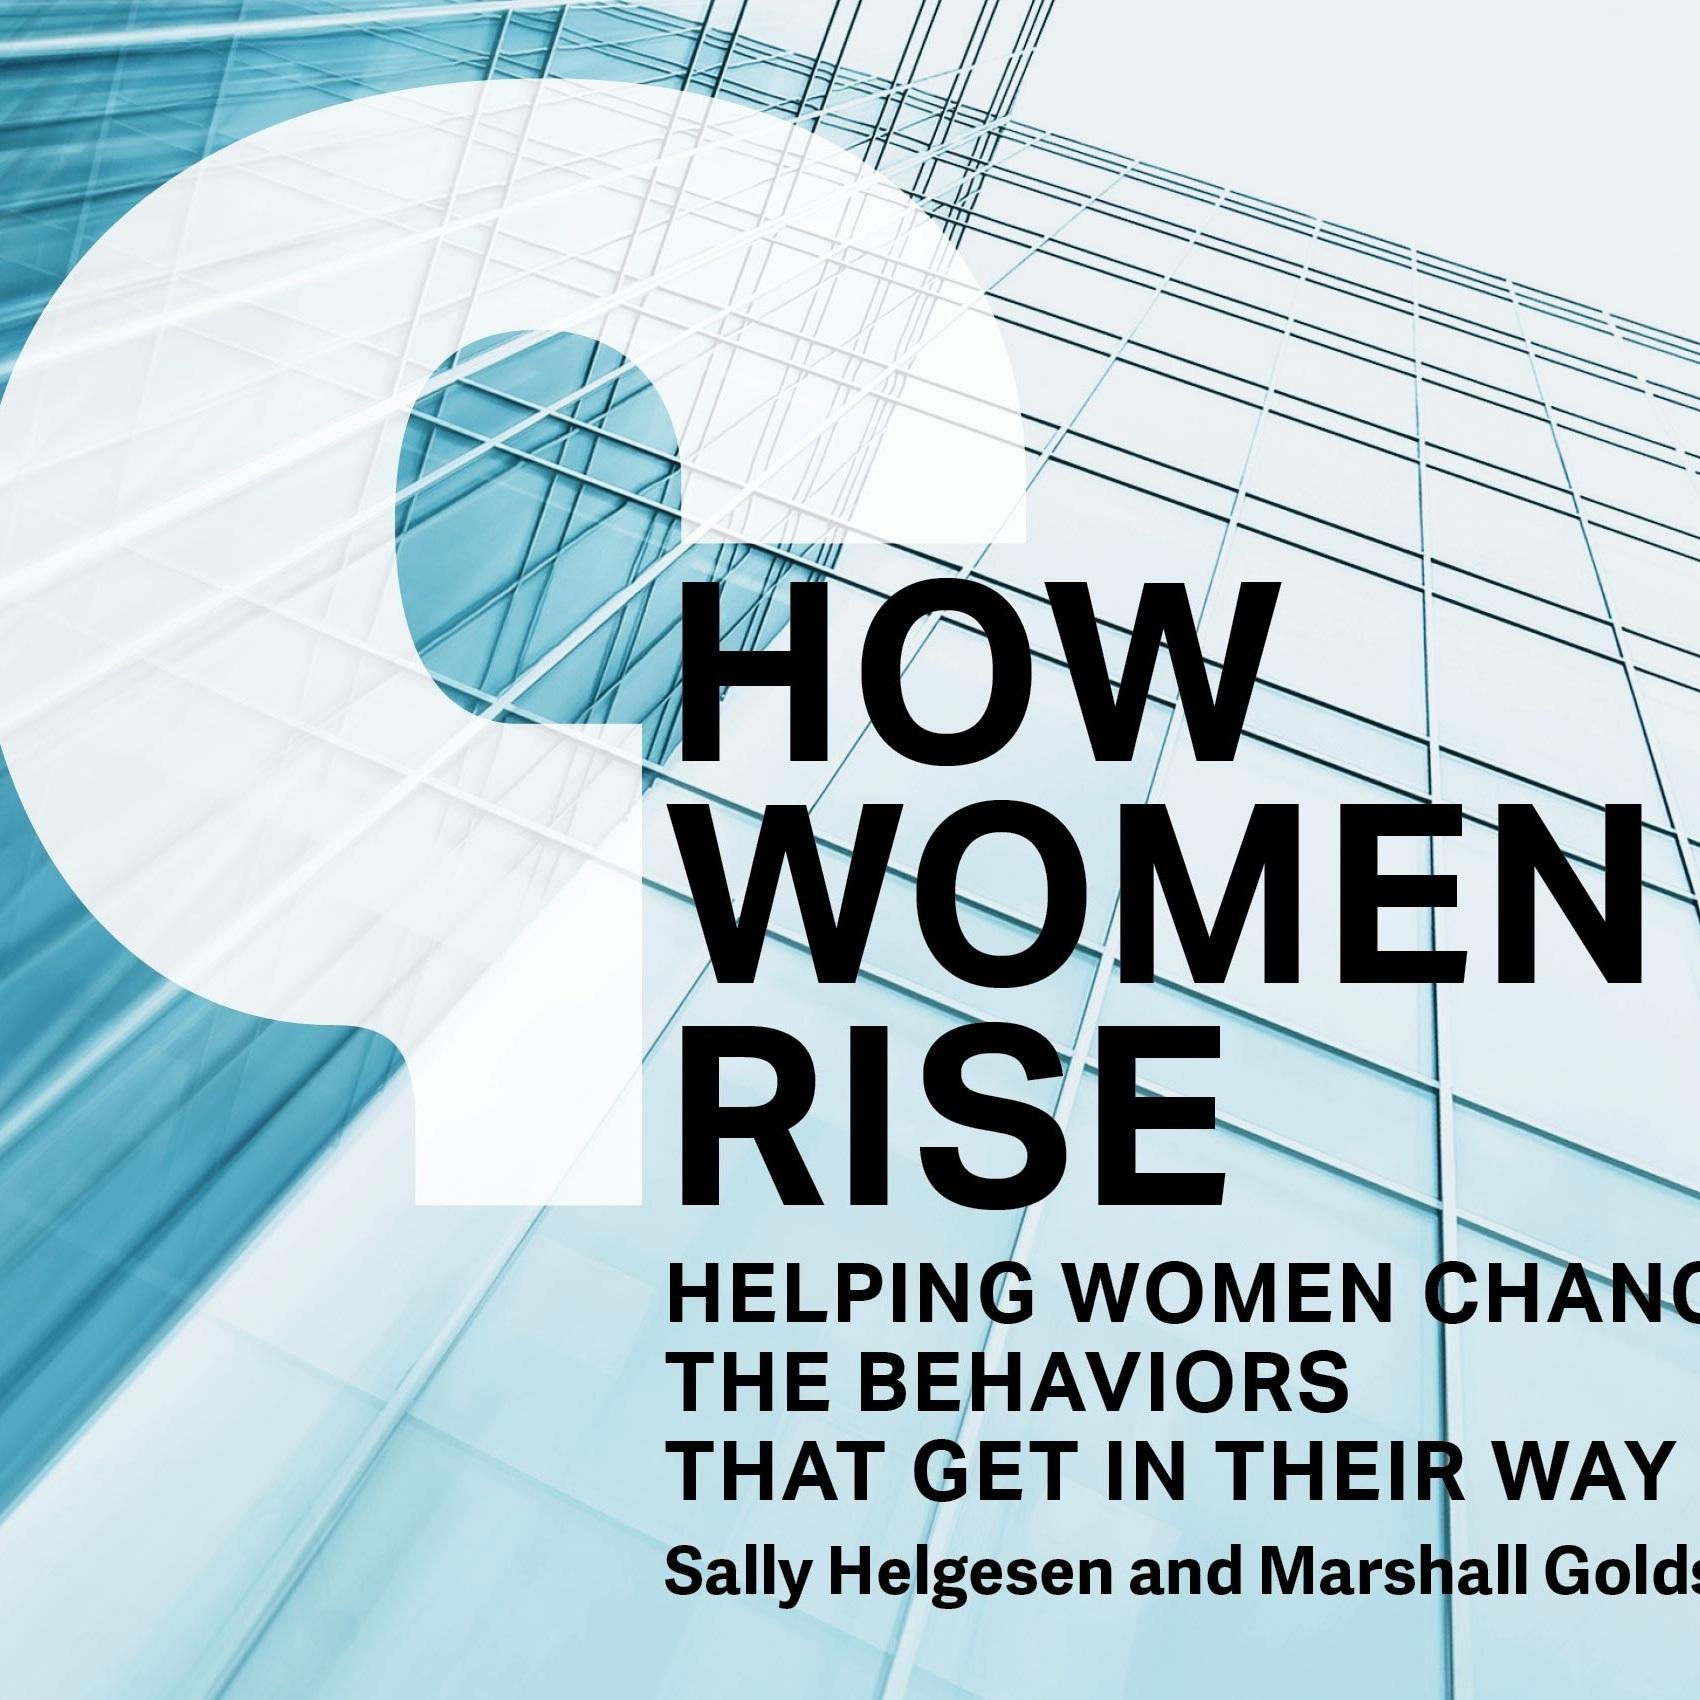 laura-rose-creative-how-women-rise